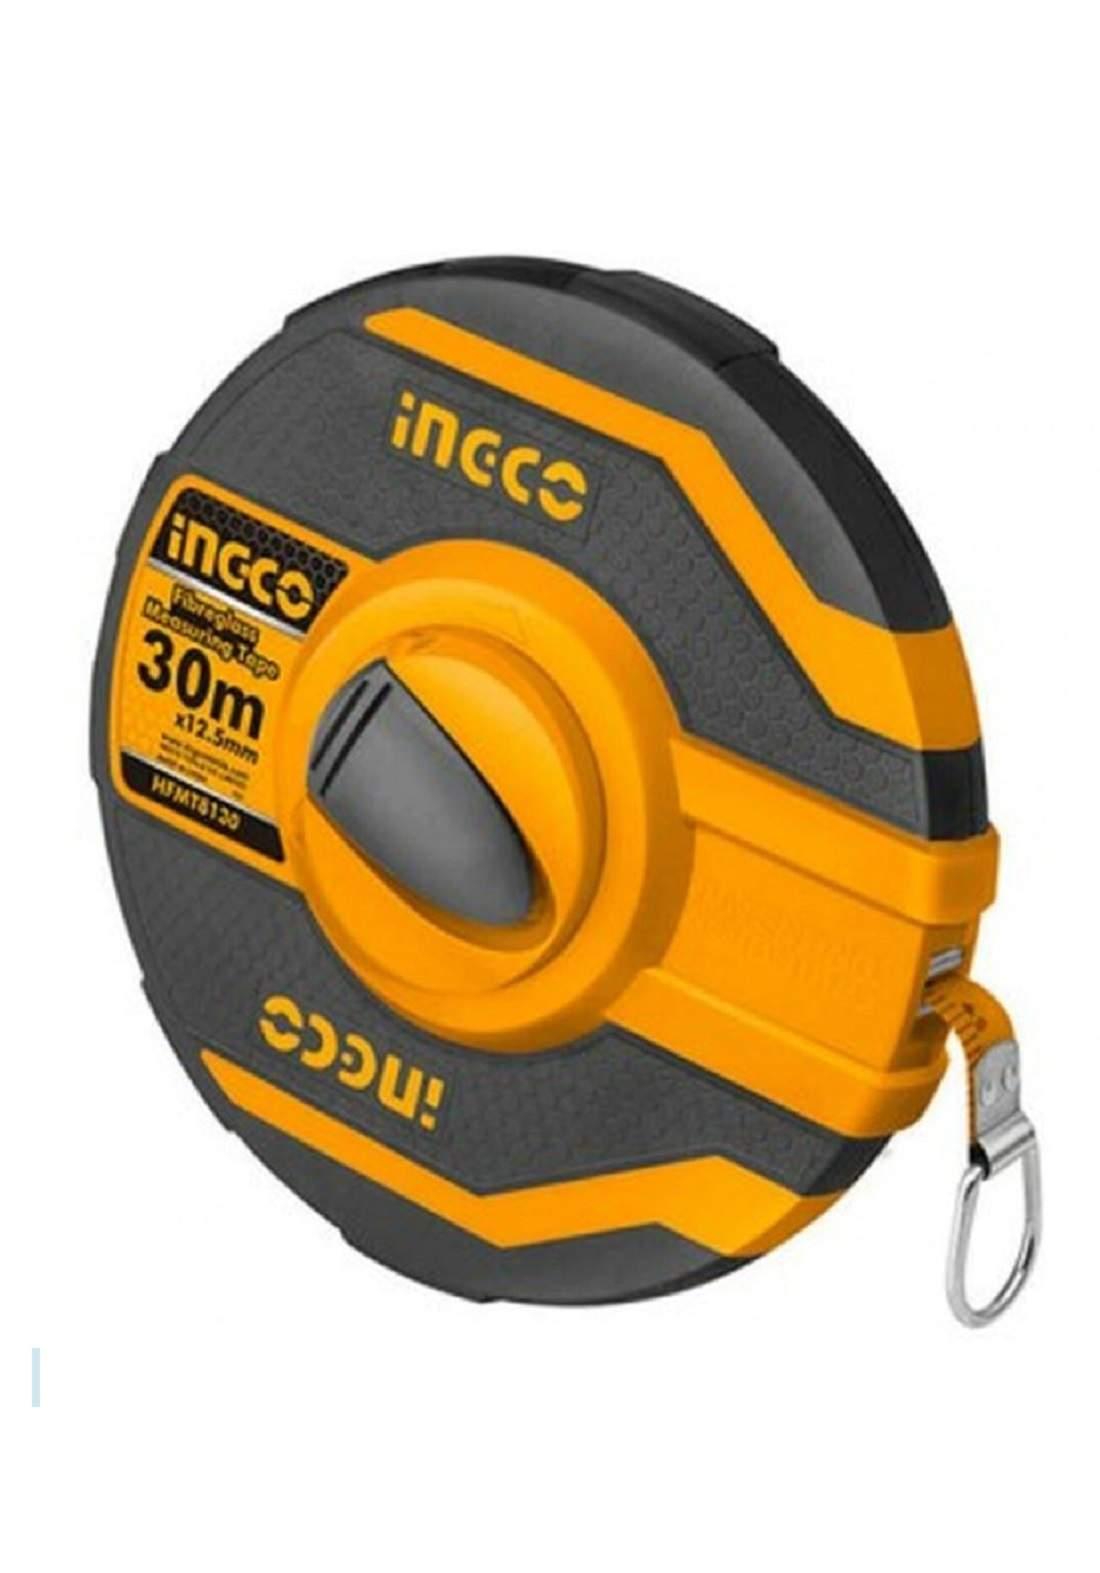 INGCO HFMT8130 Fiberglass Measuring Tape 30m فيته قماش شريطيه 30م سوبر